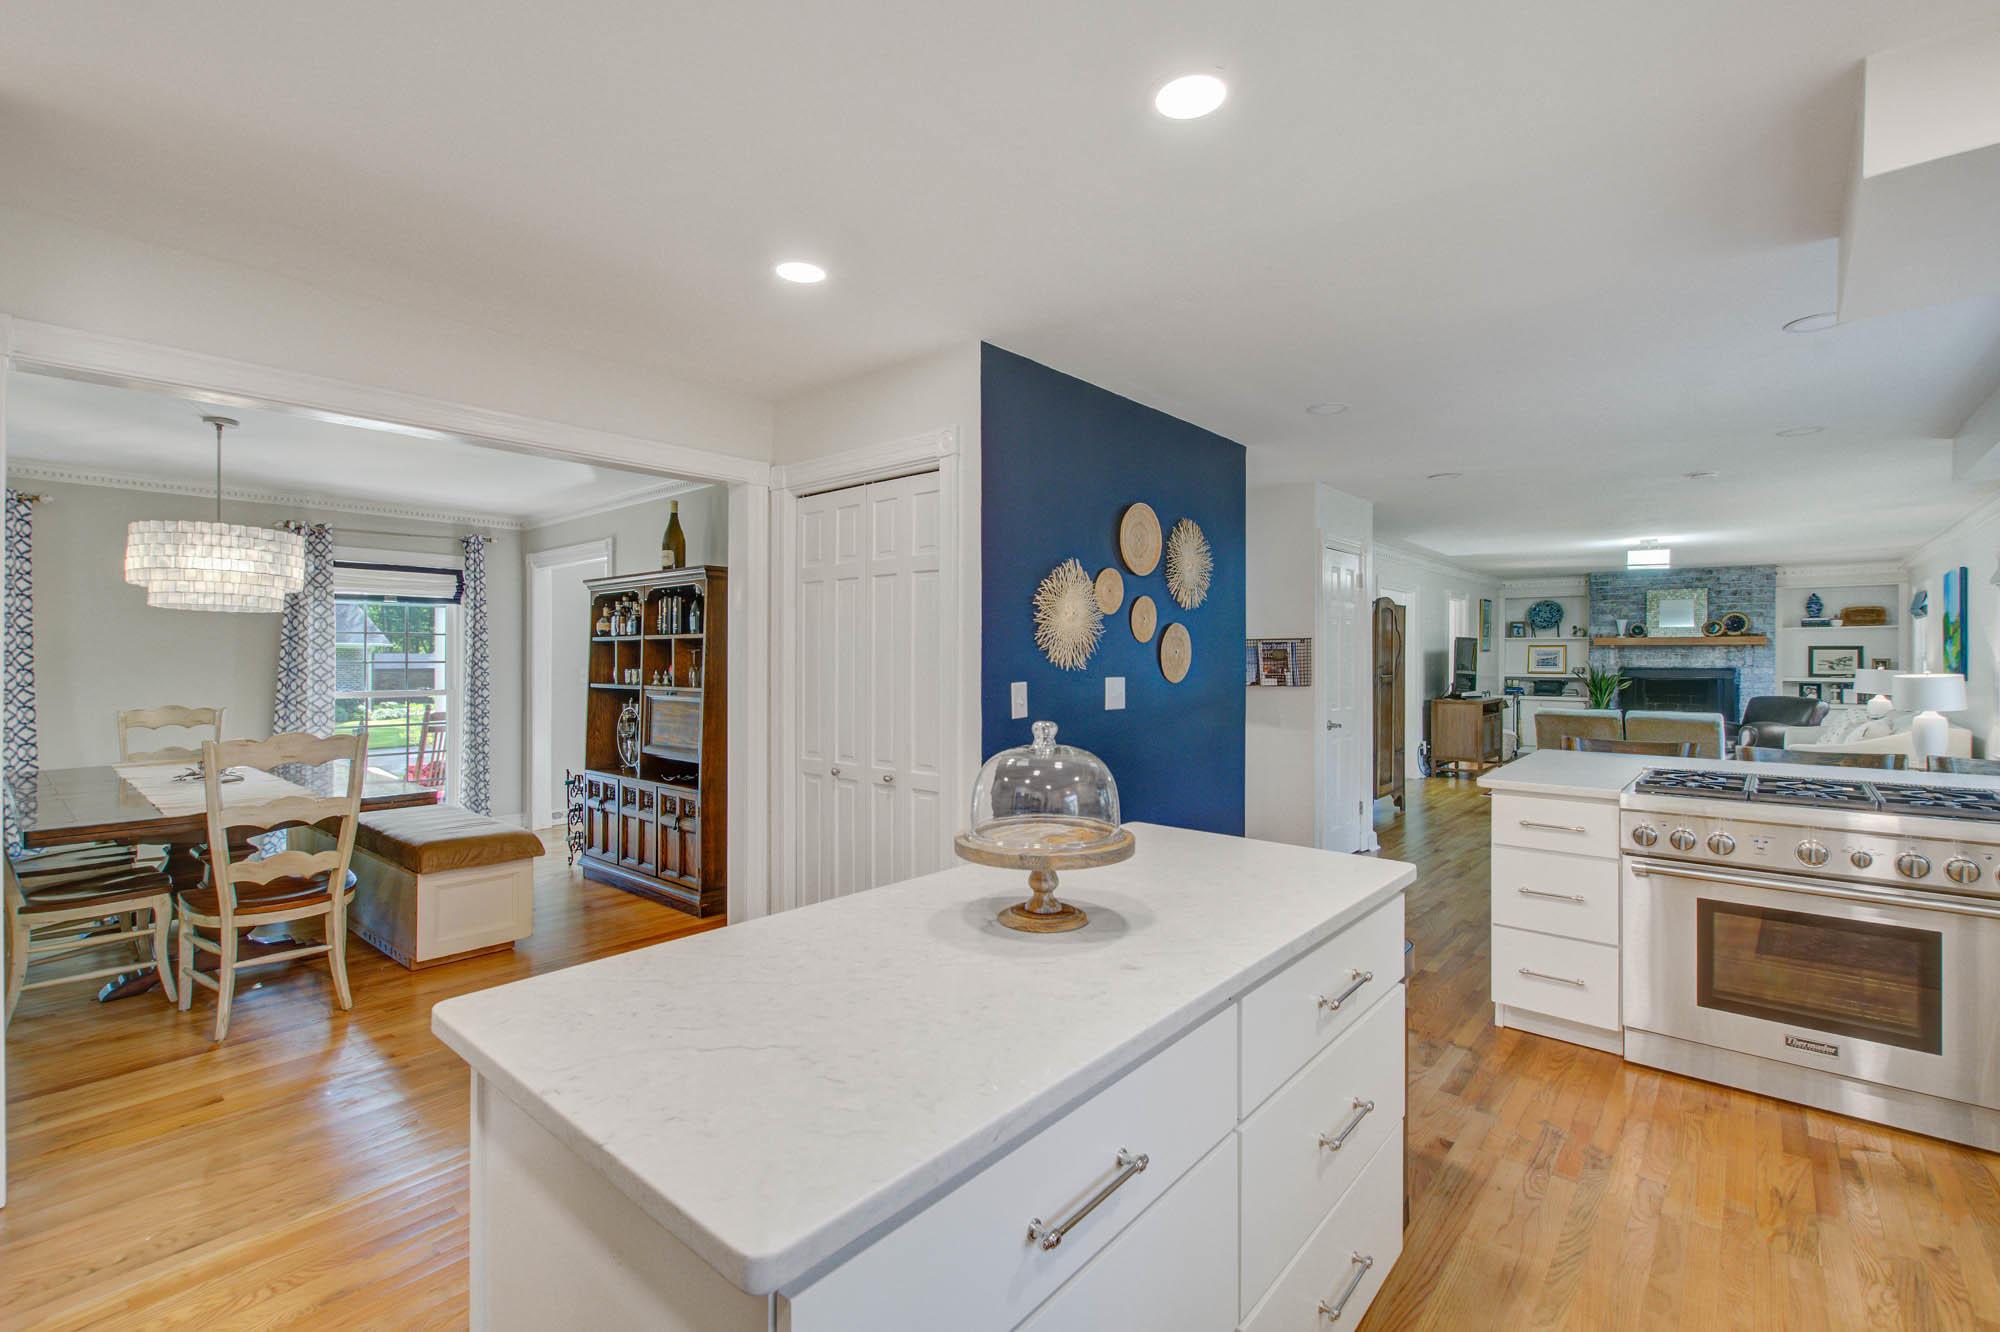 Sandhurst Homes For Sale - 37 Sussex, Charleston, SC - 0